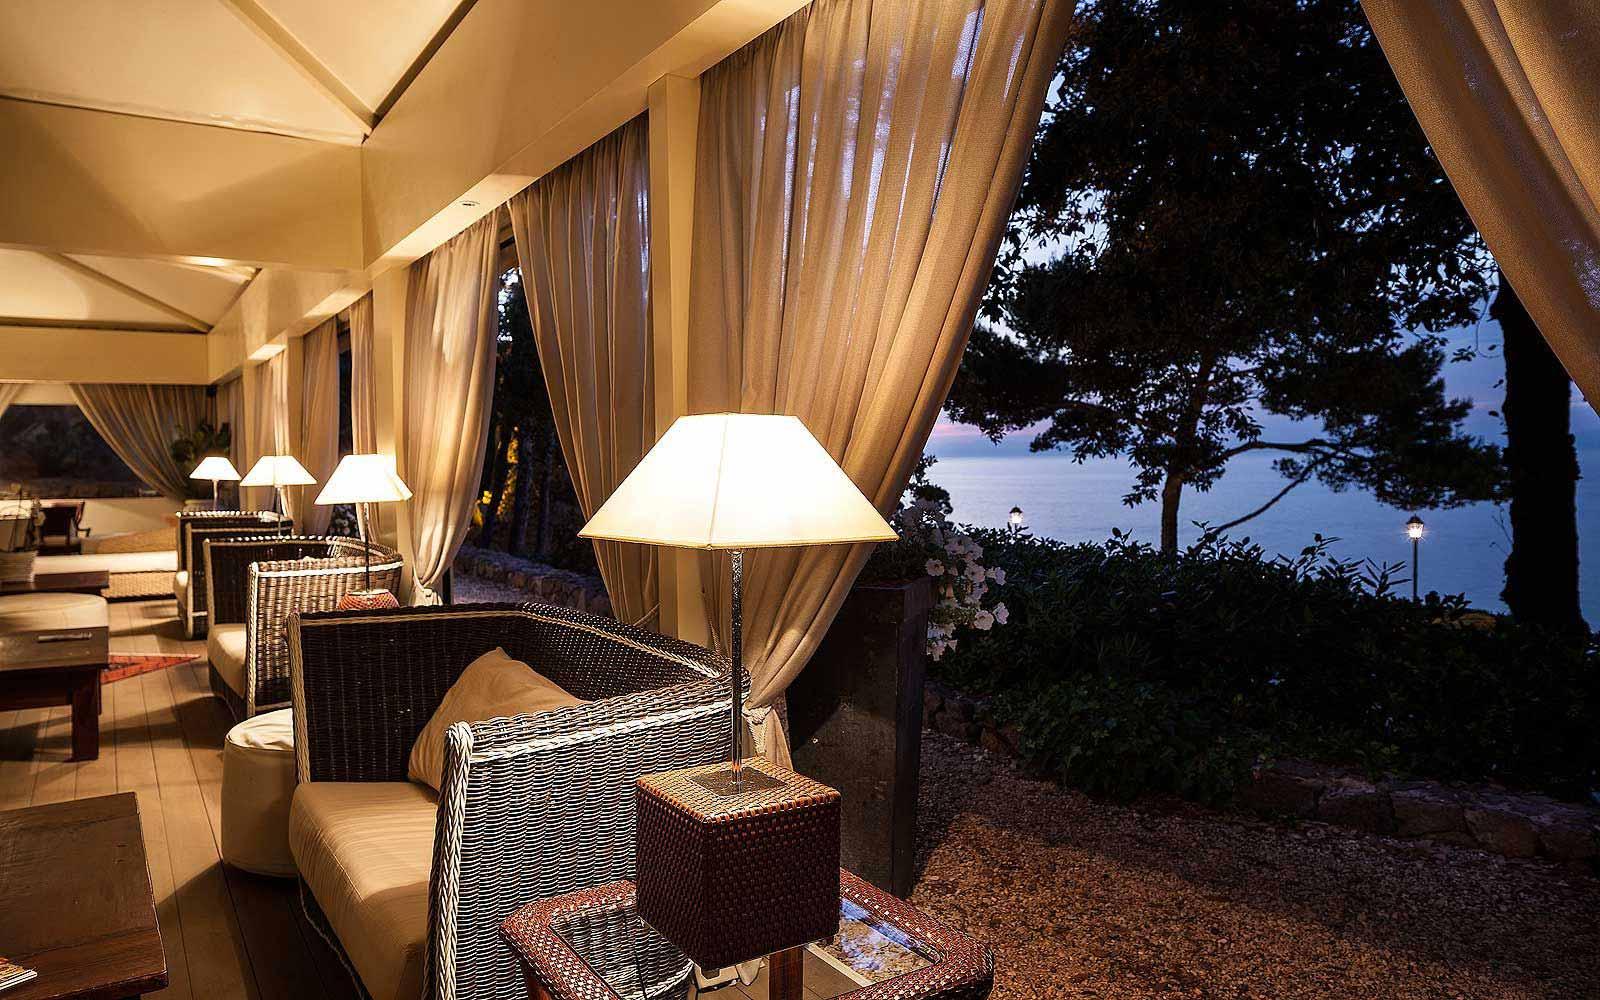 Gazebo Lounge & Piano Bar at Mezzatorre Resort & Spa